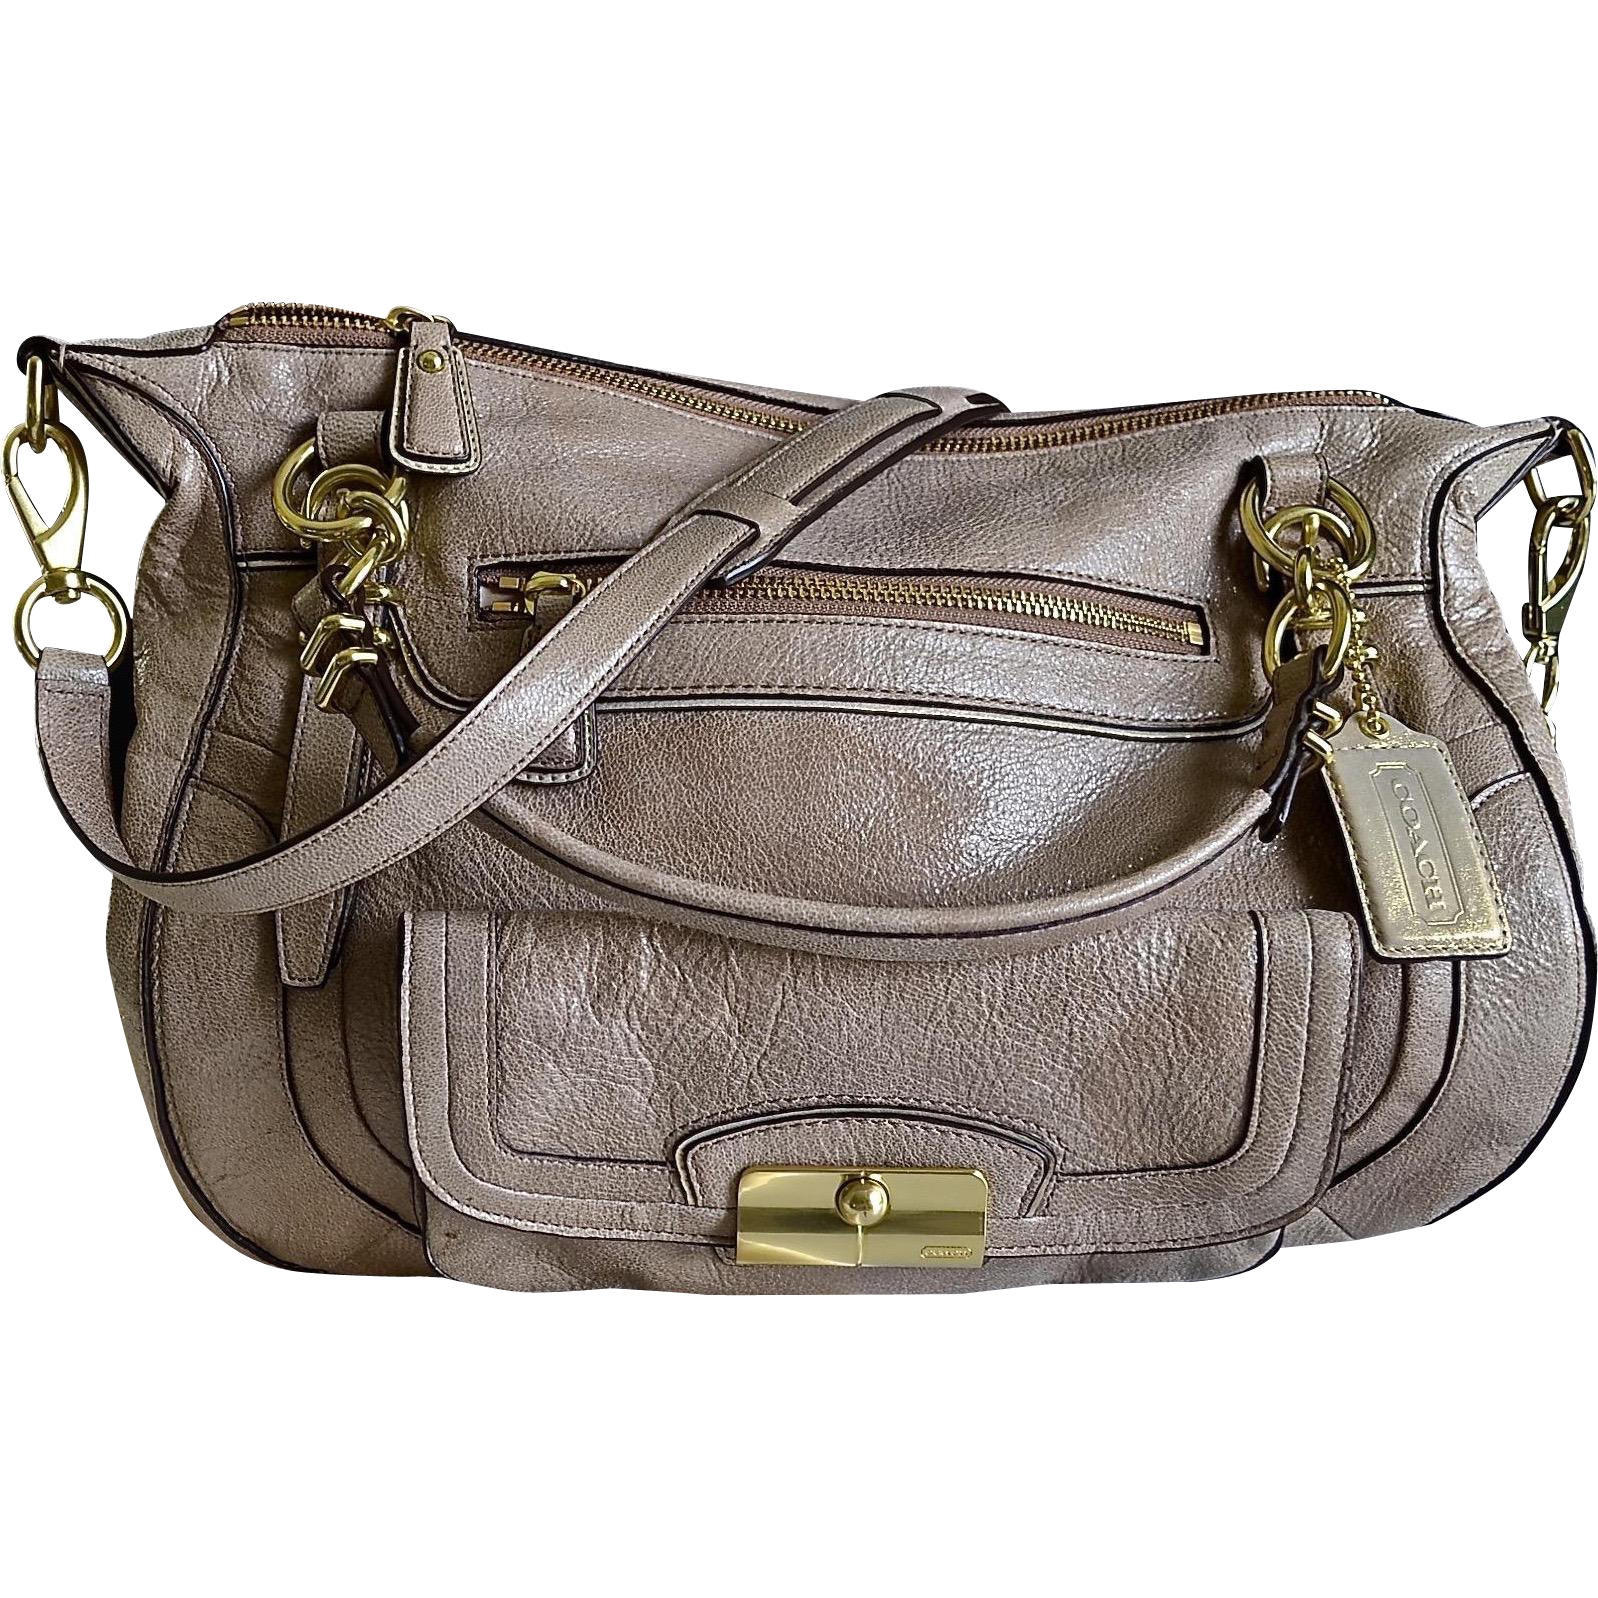 Coach Kristin Travel Computer Leather Luggage Tote Handbag